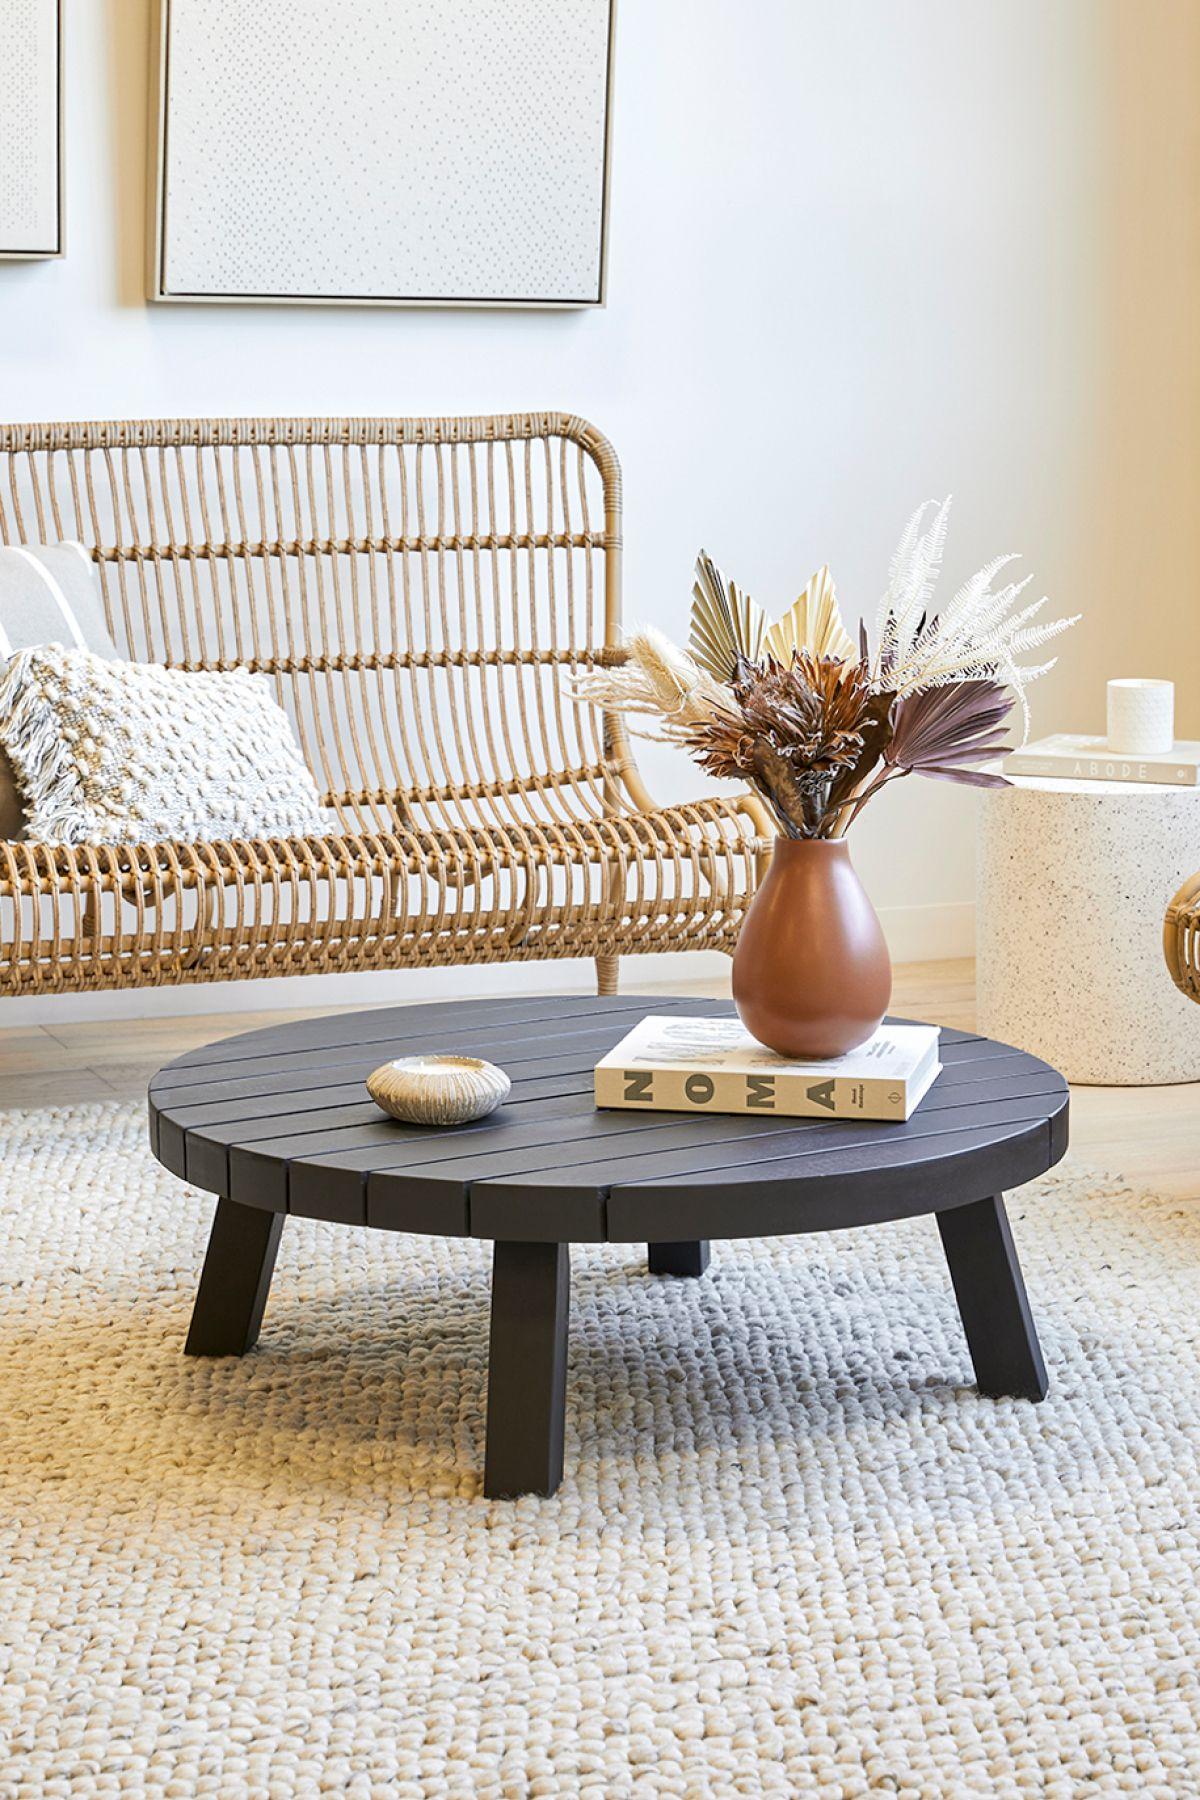 Koel Black Coffee Table Coffee Table Decor Black Coffee Tables [ 1800 x 1200 Pixel ]